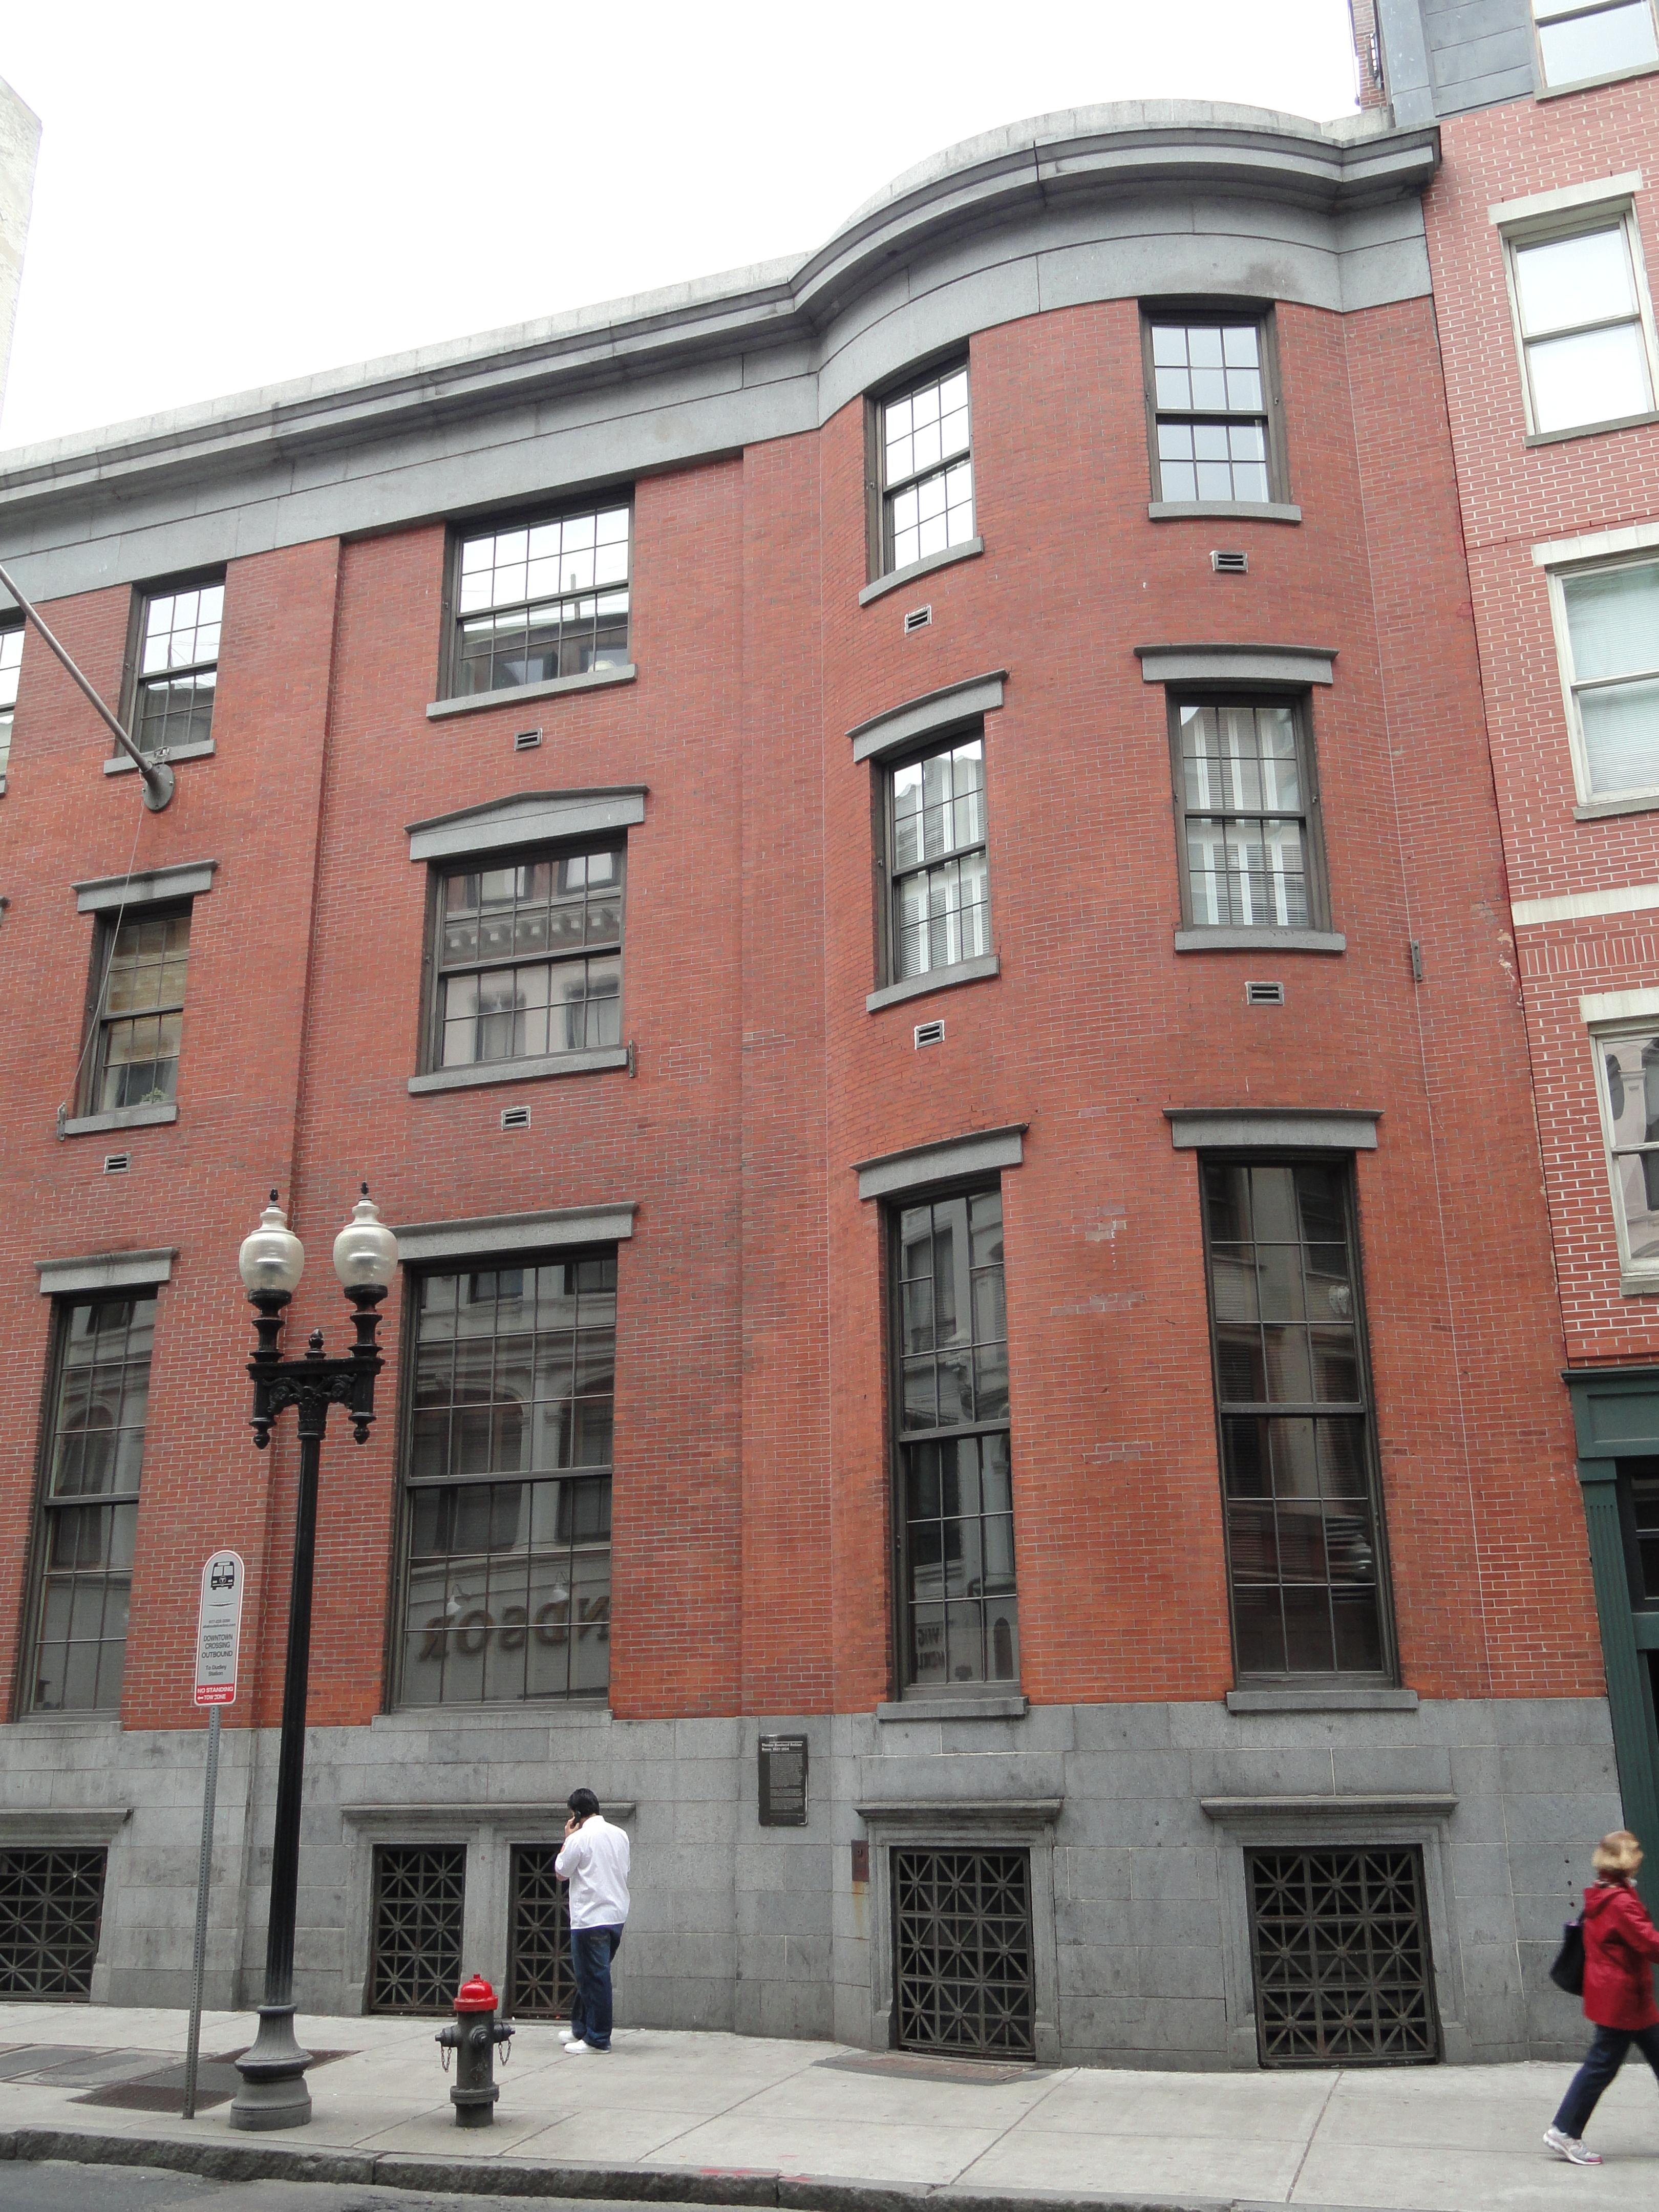 Awesome File Thomas Handasyd Perkins House Boston Ma Dsc05875 Home Interior And Landscaping Ologienasavecom